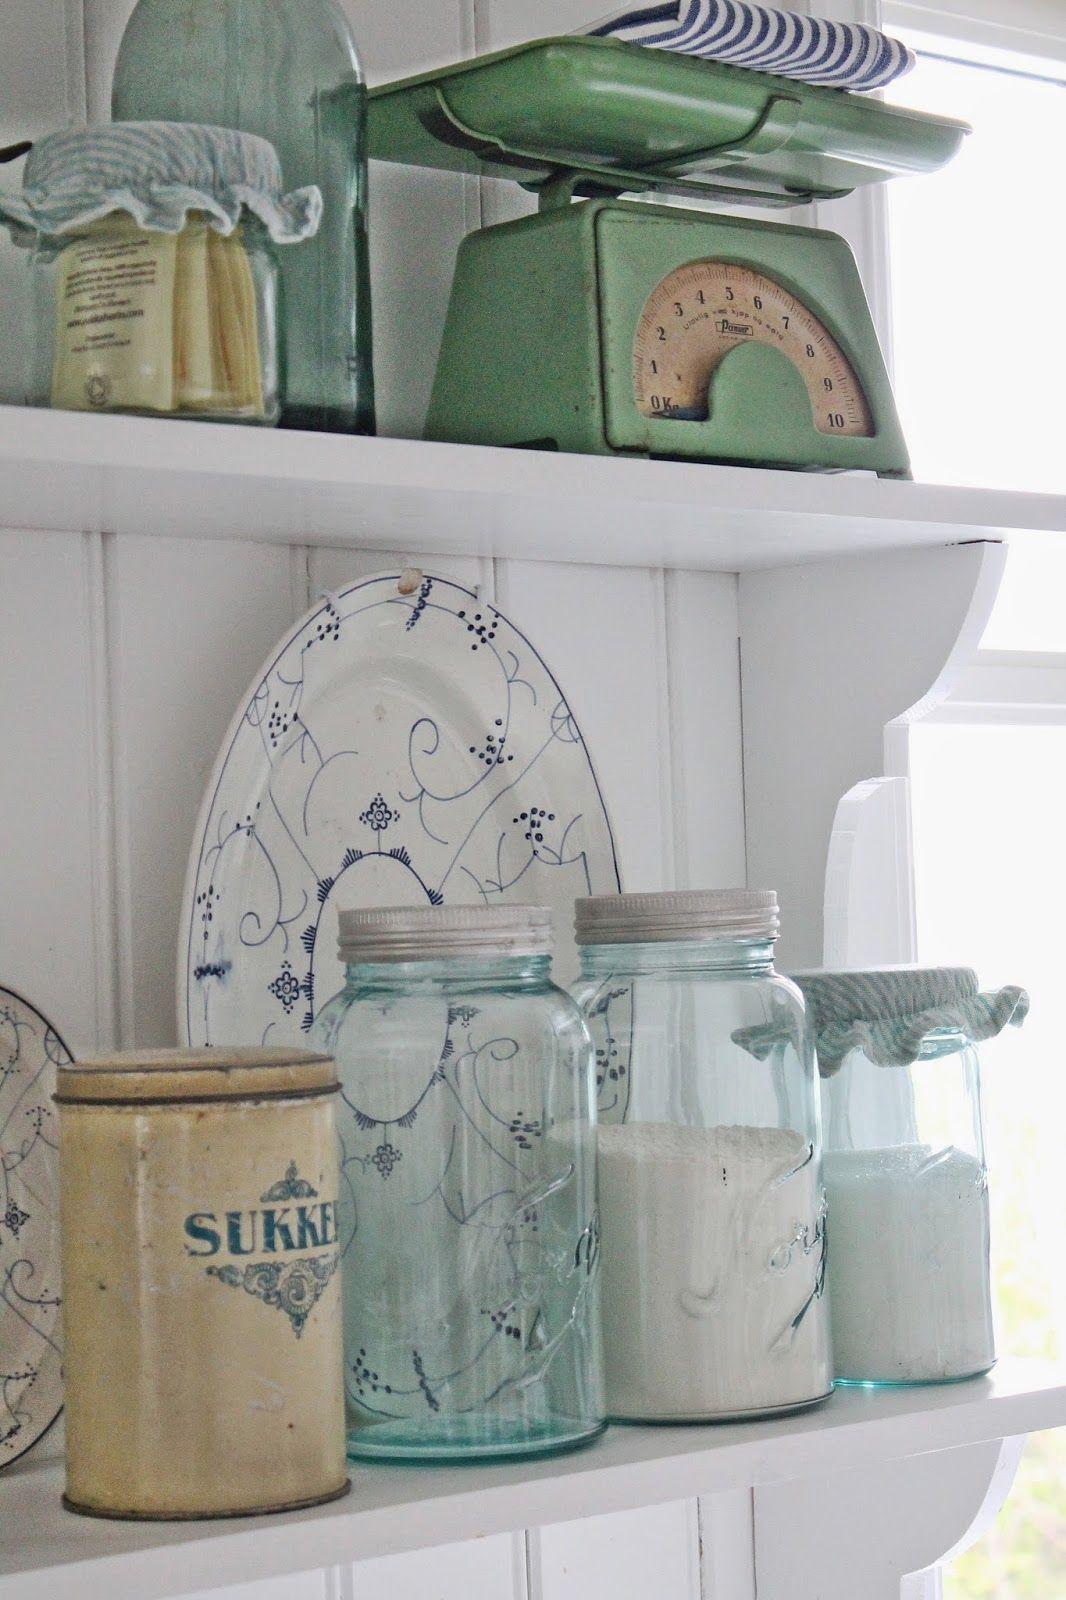 shabby chic kitchen decor cost to reface cabinets decoração vintage com latas mason jars e